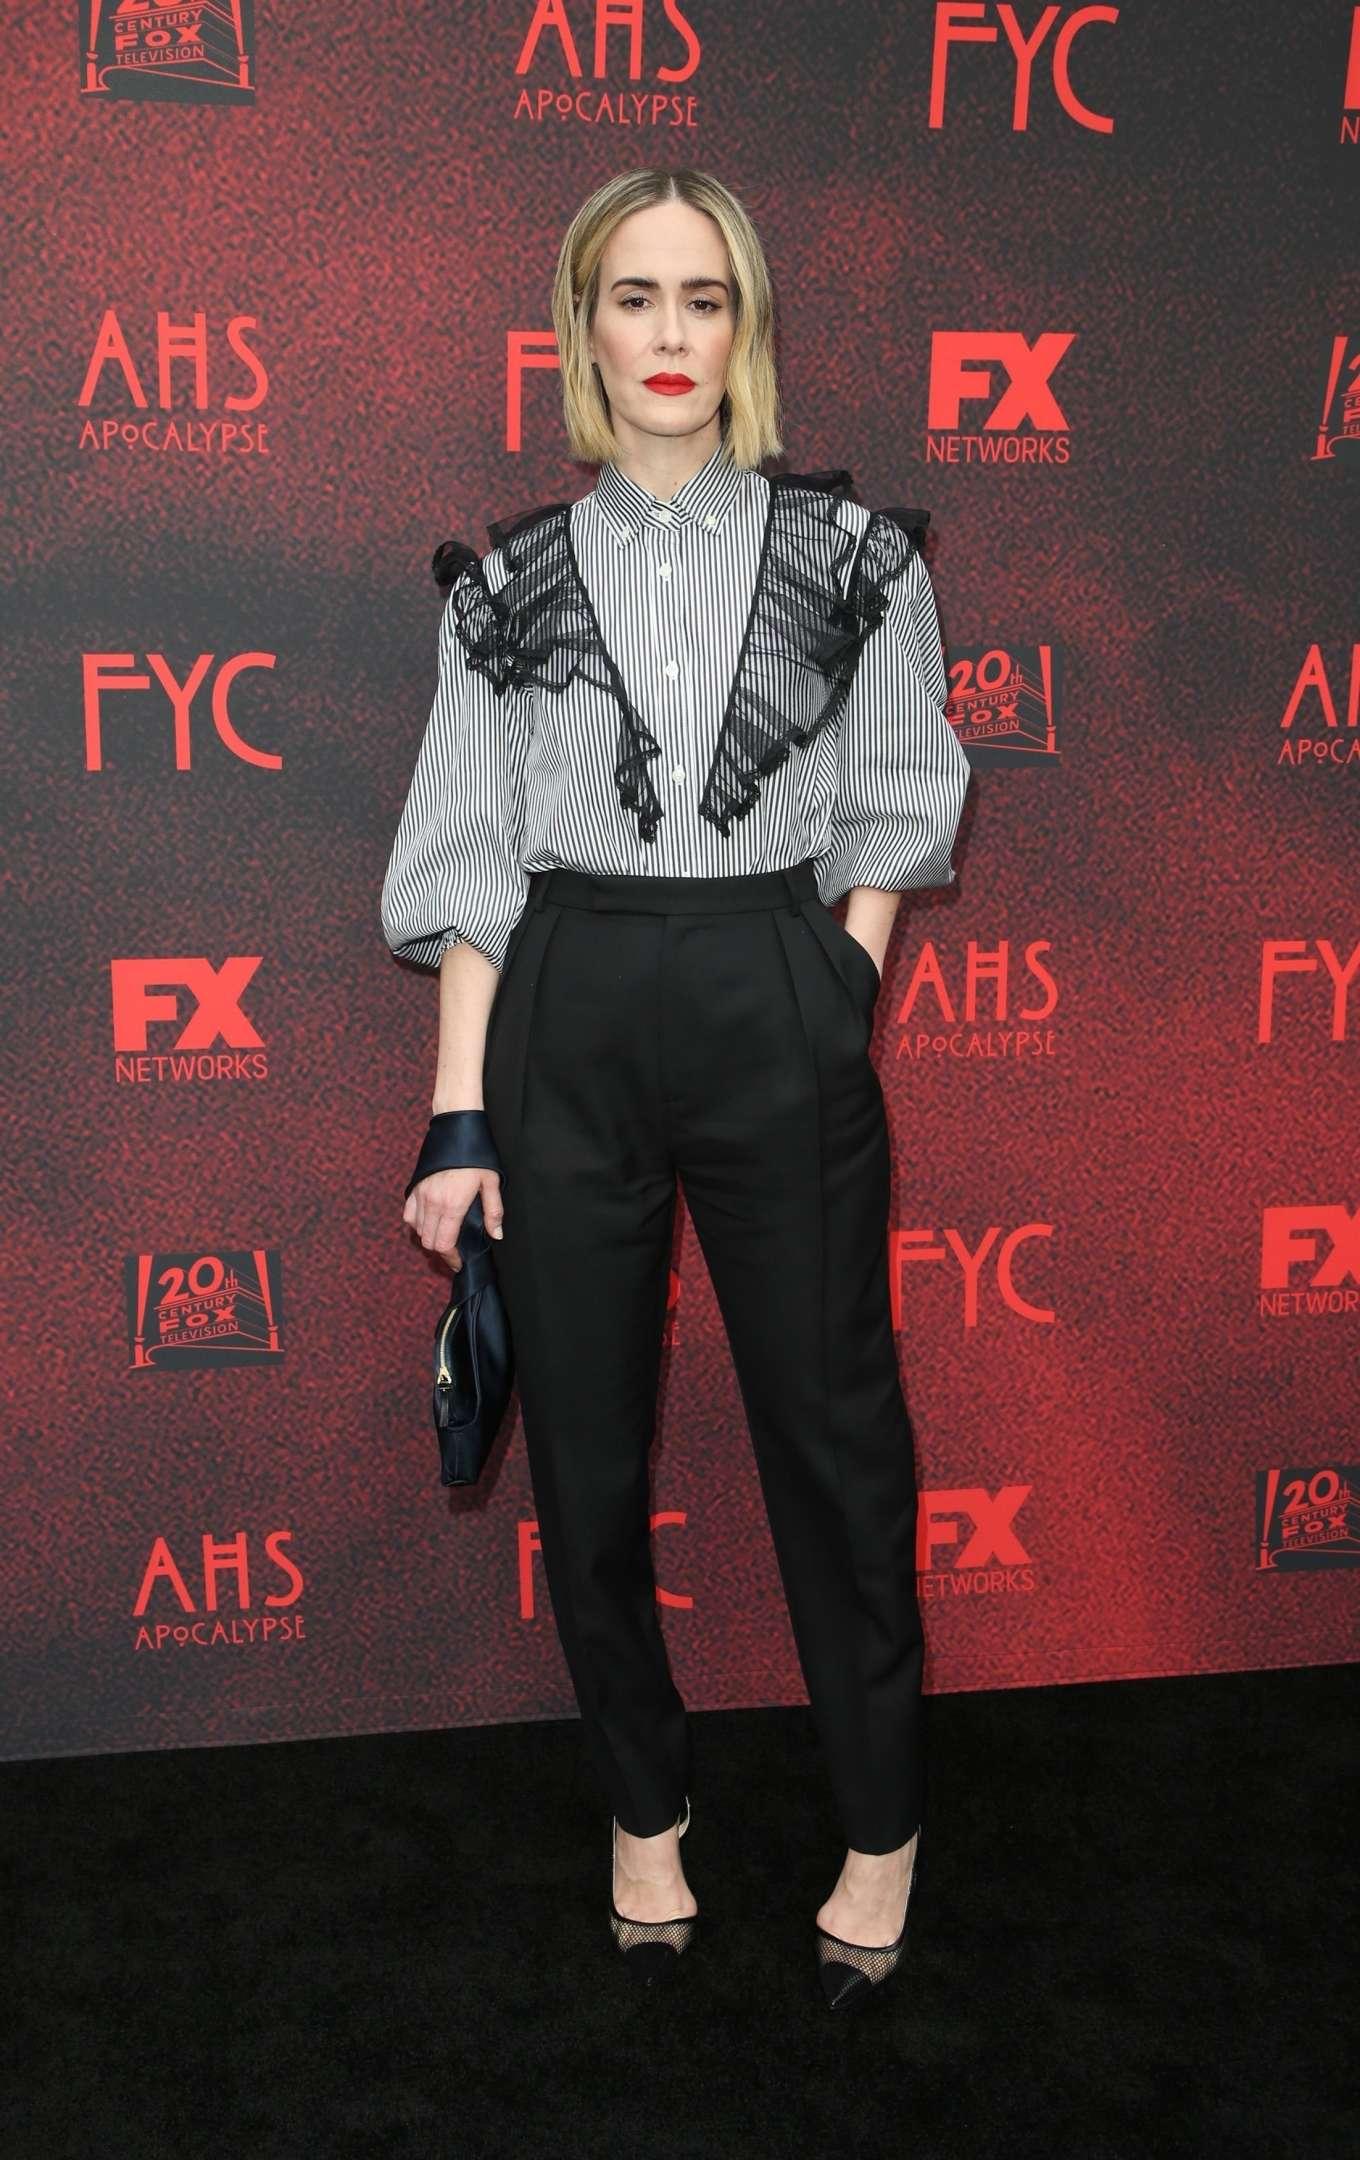 Sarah Paulson at the American Horror Story: Apocalypse